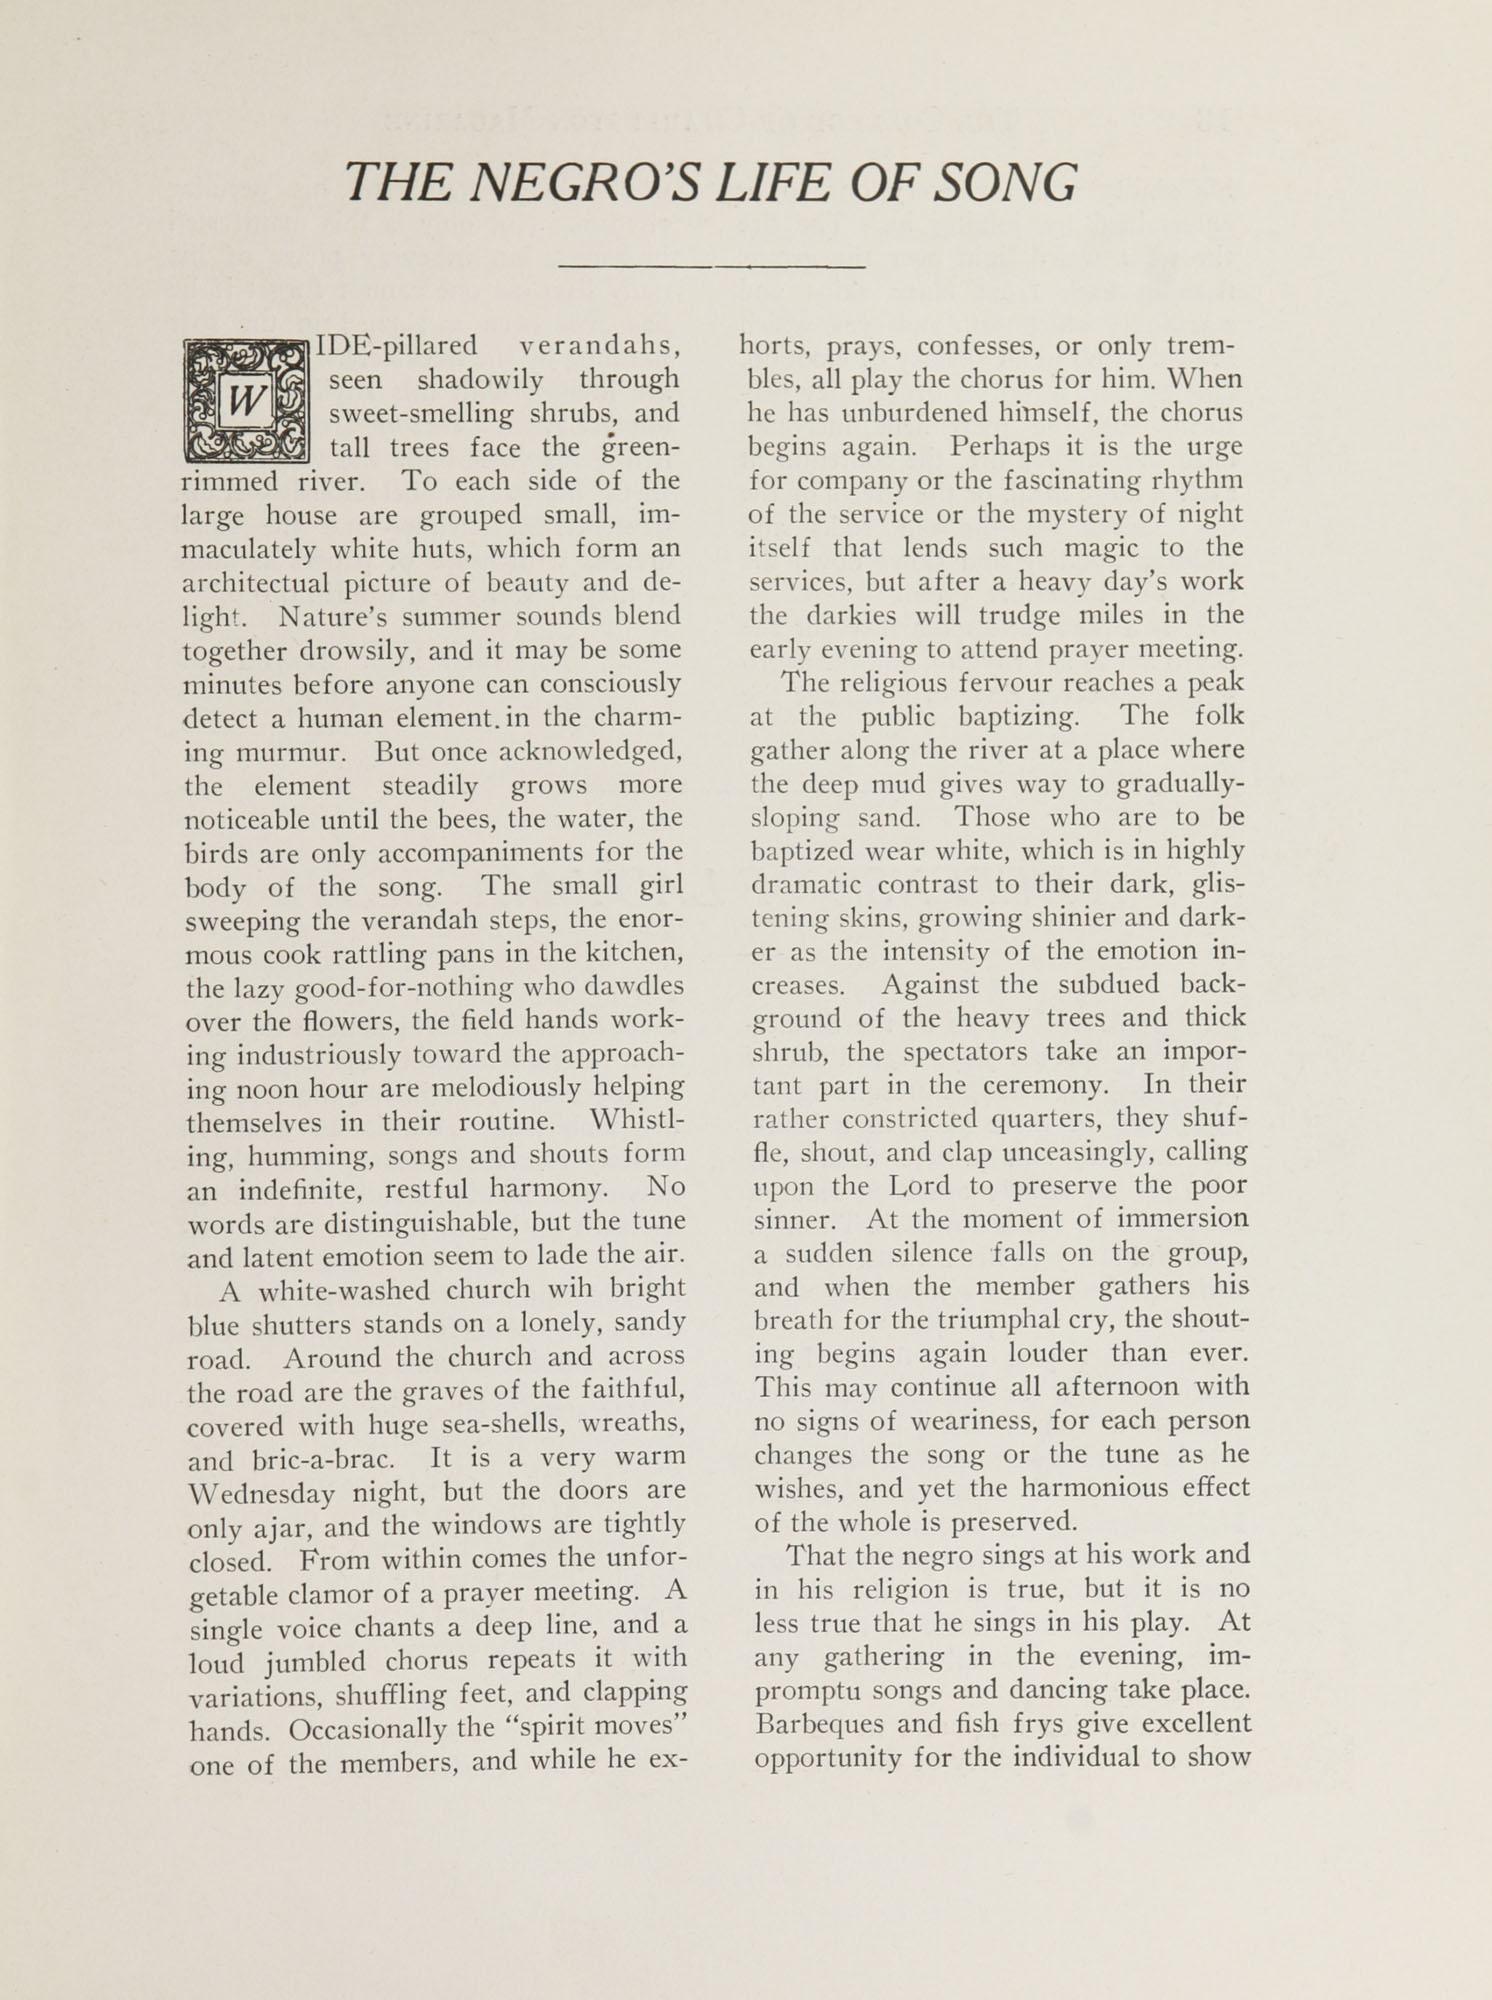 College of Charleston Magazine, 1937-1938, Vol. XXXXI No. 1, page 17